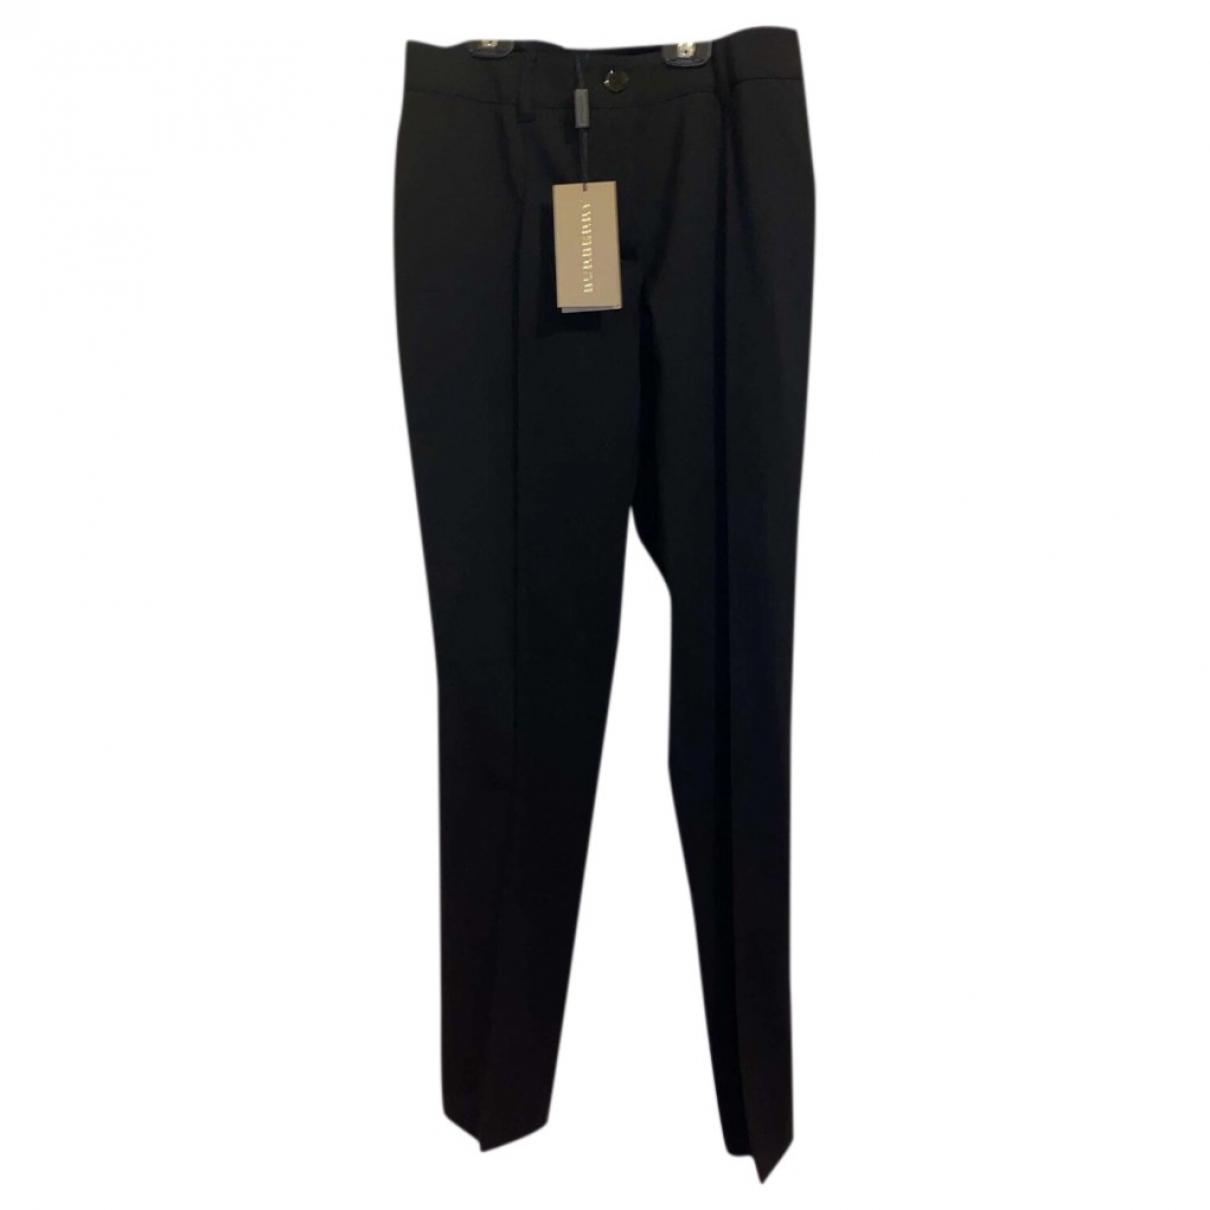 Burberry \N Black Trousers for Women 6 UK